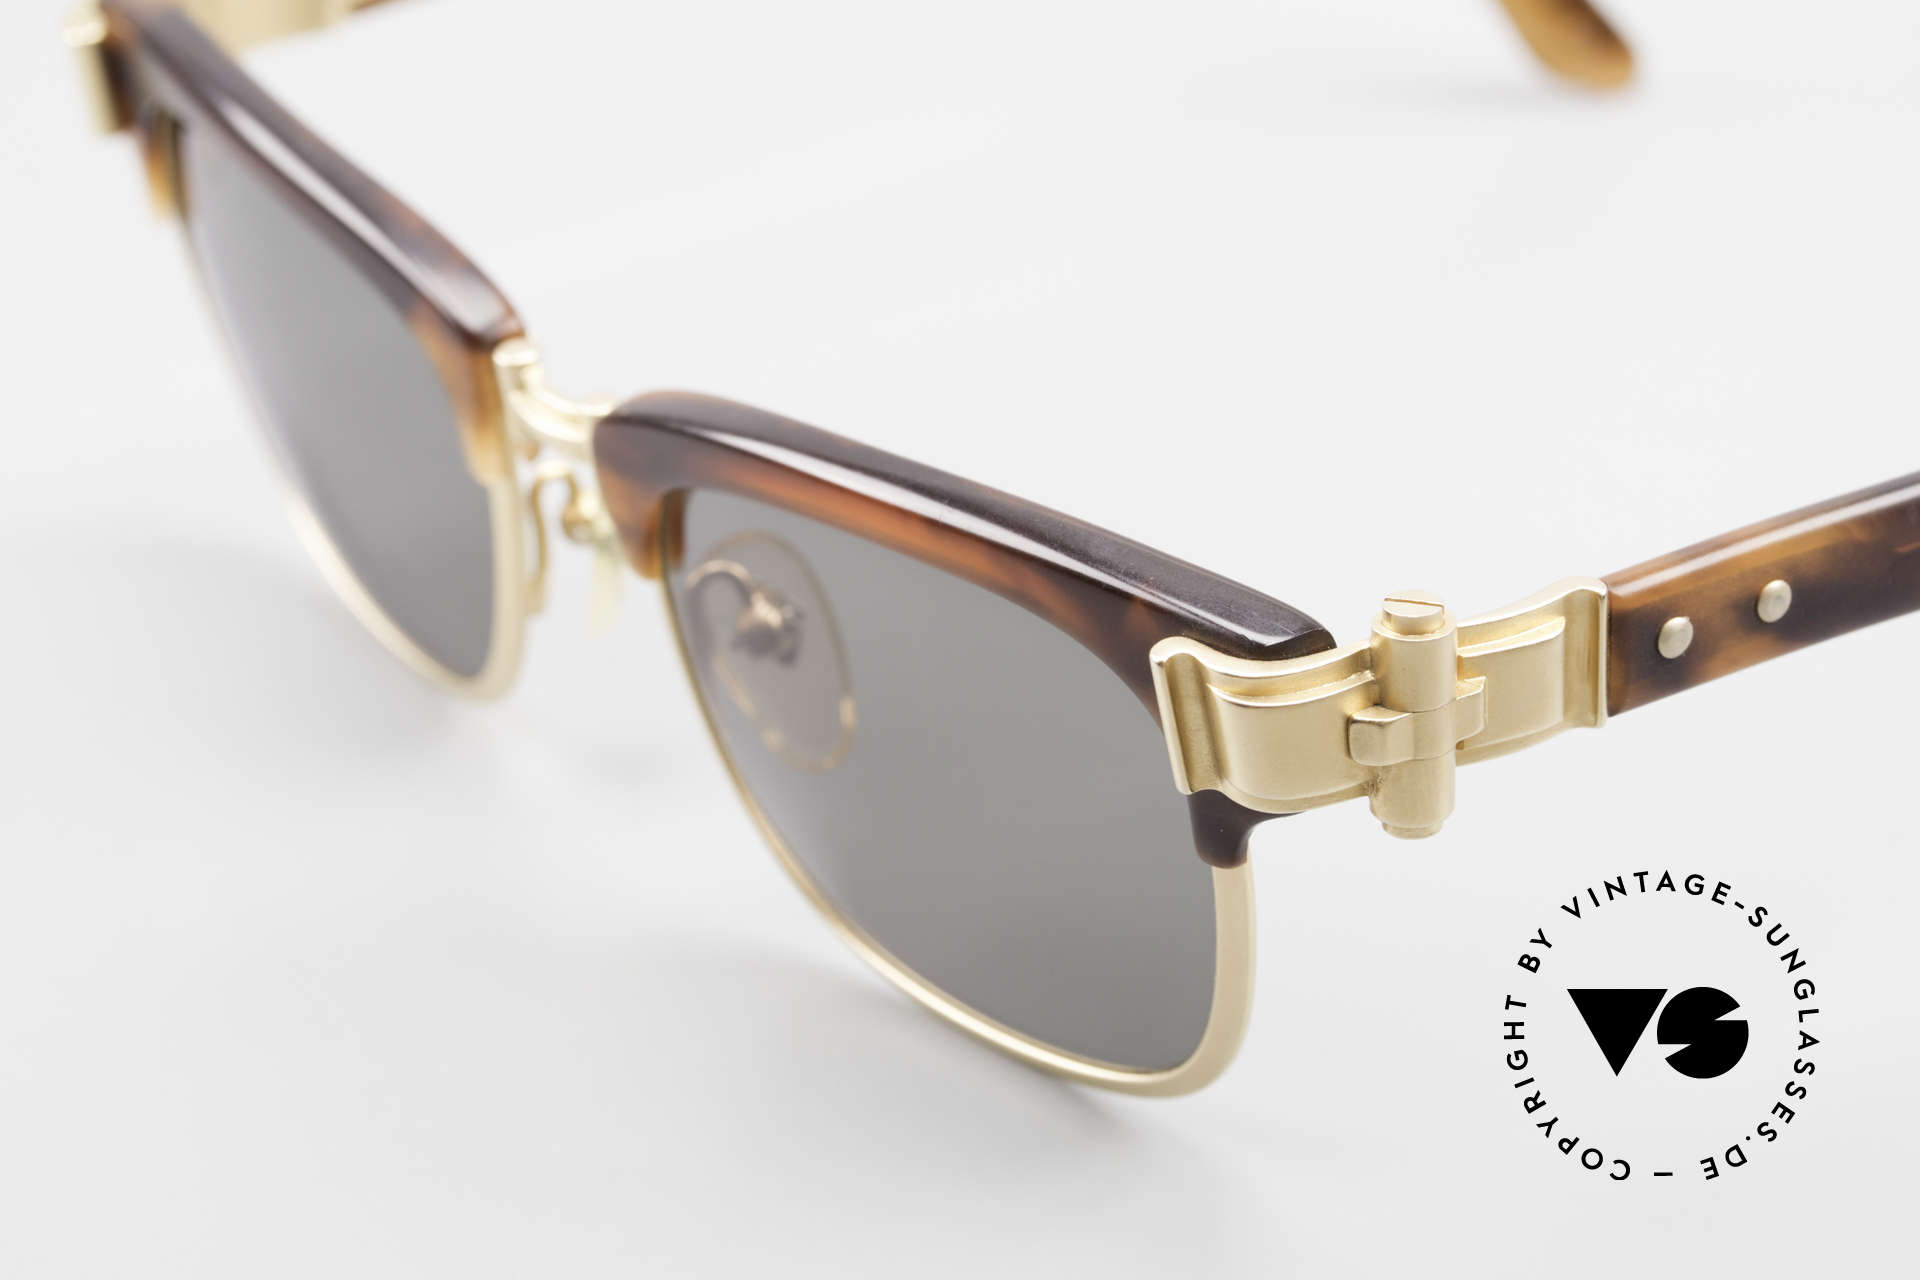 Jean Paul Gaultier 56-5202 JPG Vintage Designer Frame, never worn (like all our Jean Paul Gaultier sunglasses), Made for Men and Women